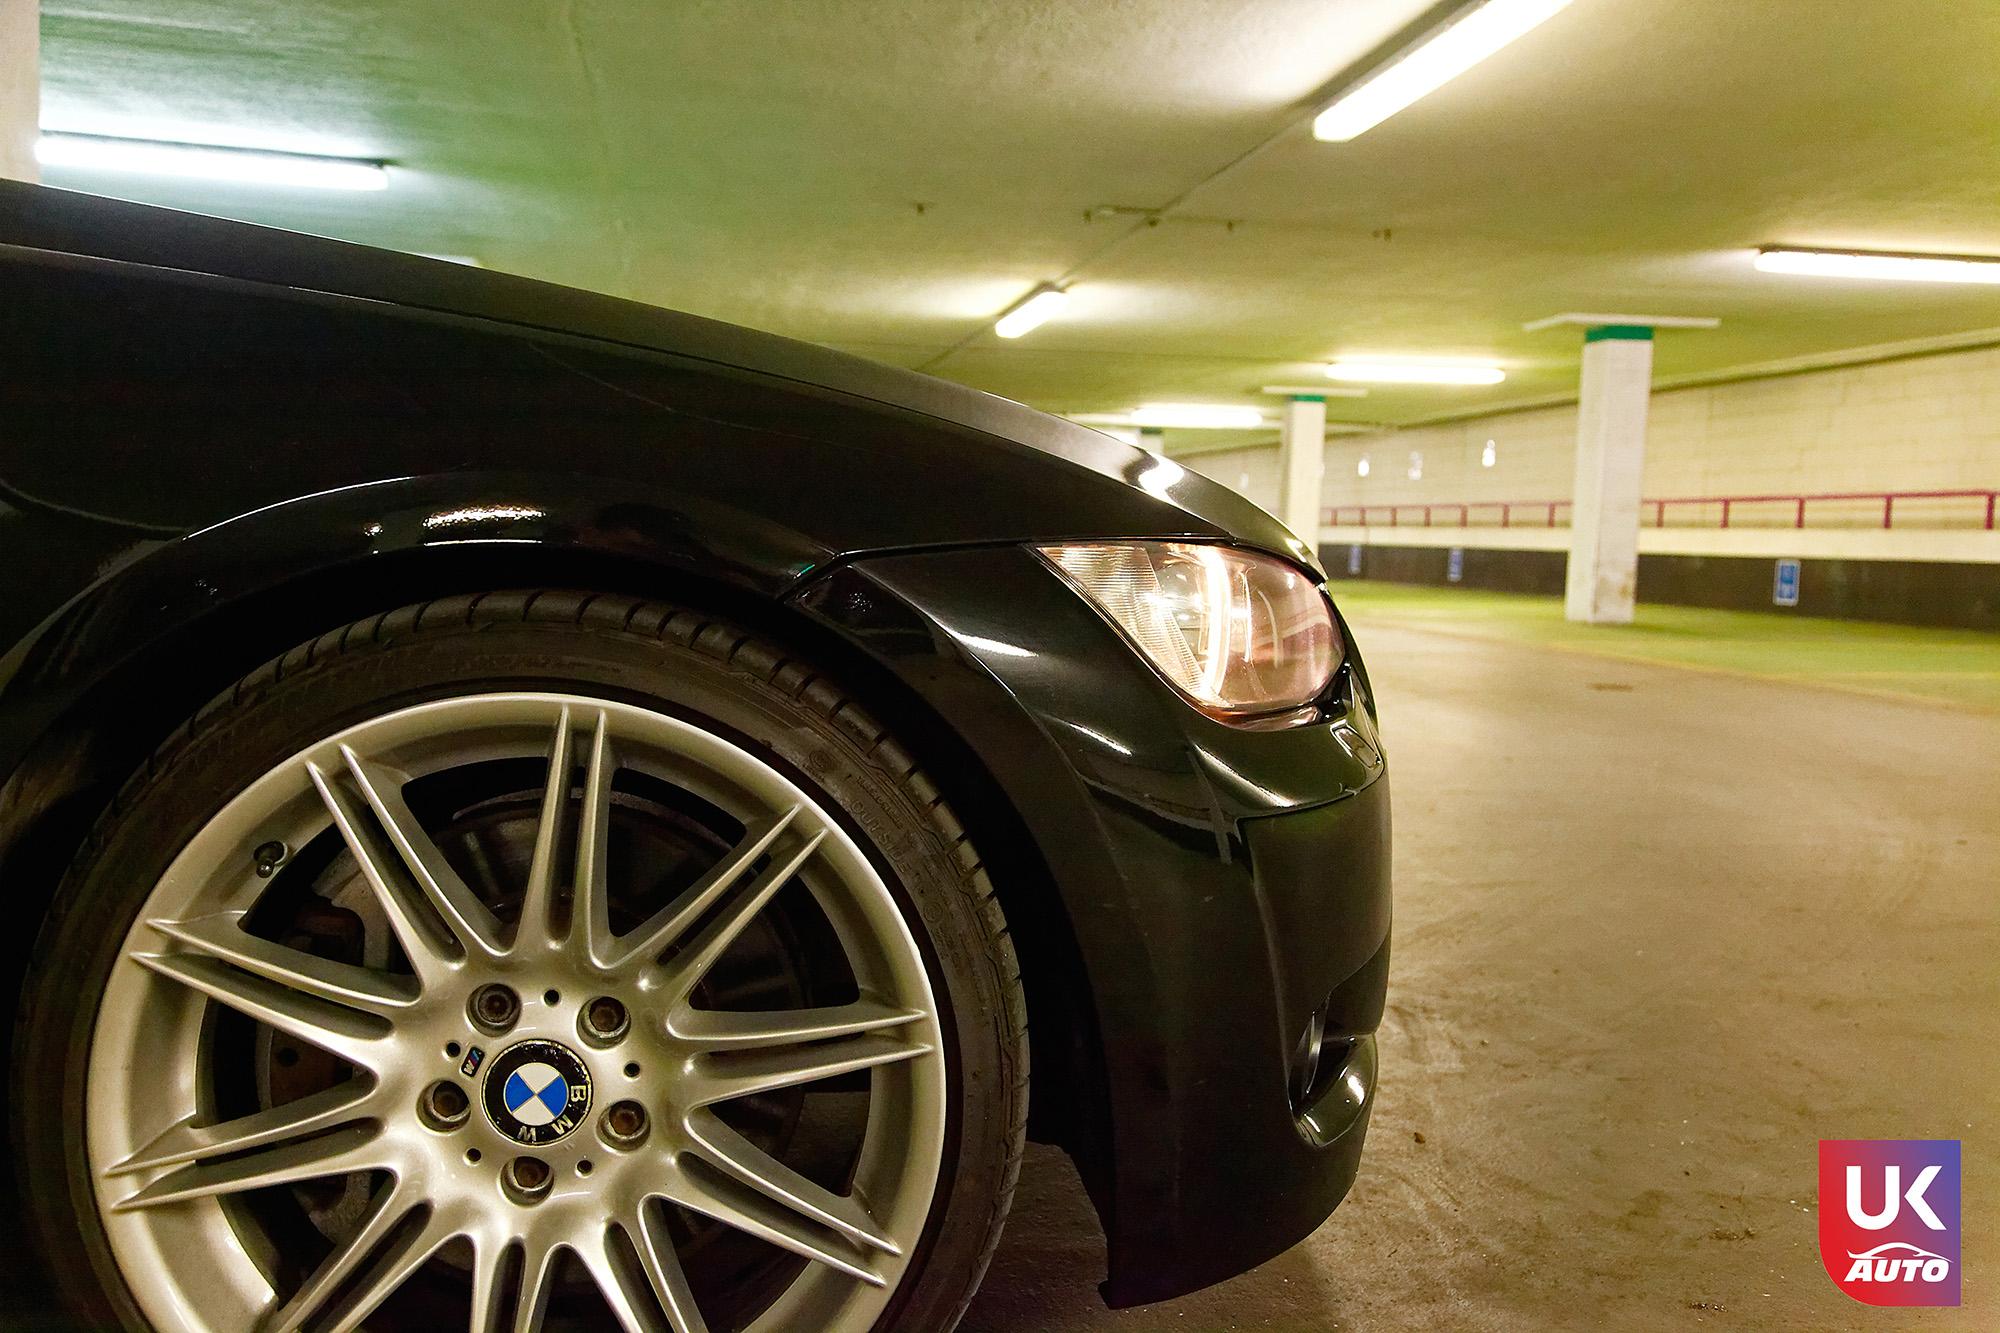 UKAUTO IMPORT ANGLETERRE BMW 335i CABRIOLET UKA RHD47 - Felecitation a Jeremie pour cette BMW 335i cabriolet RHD PACK M IMPORT AUTO ANGLAISE